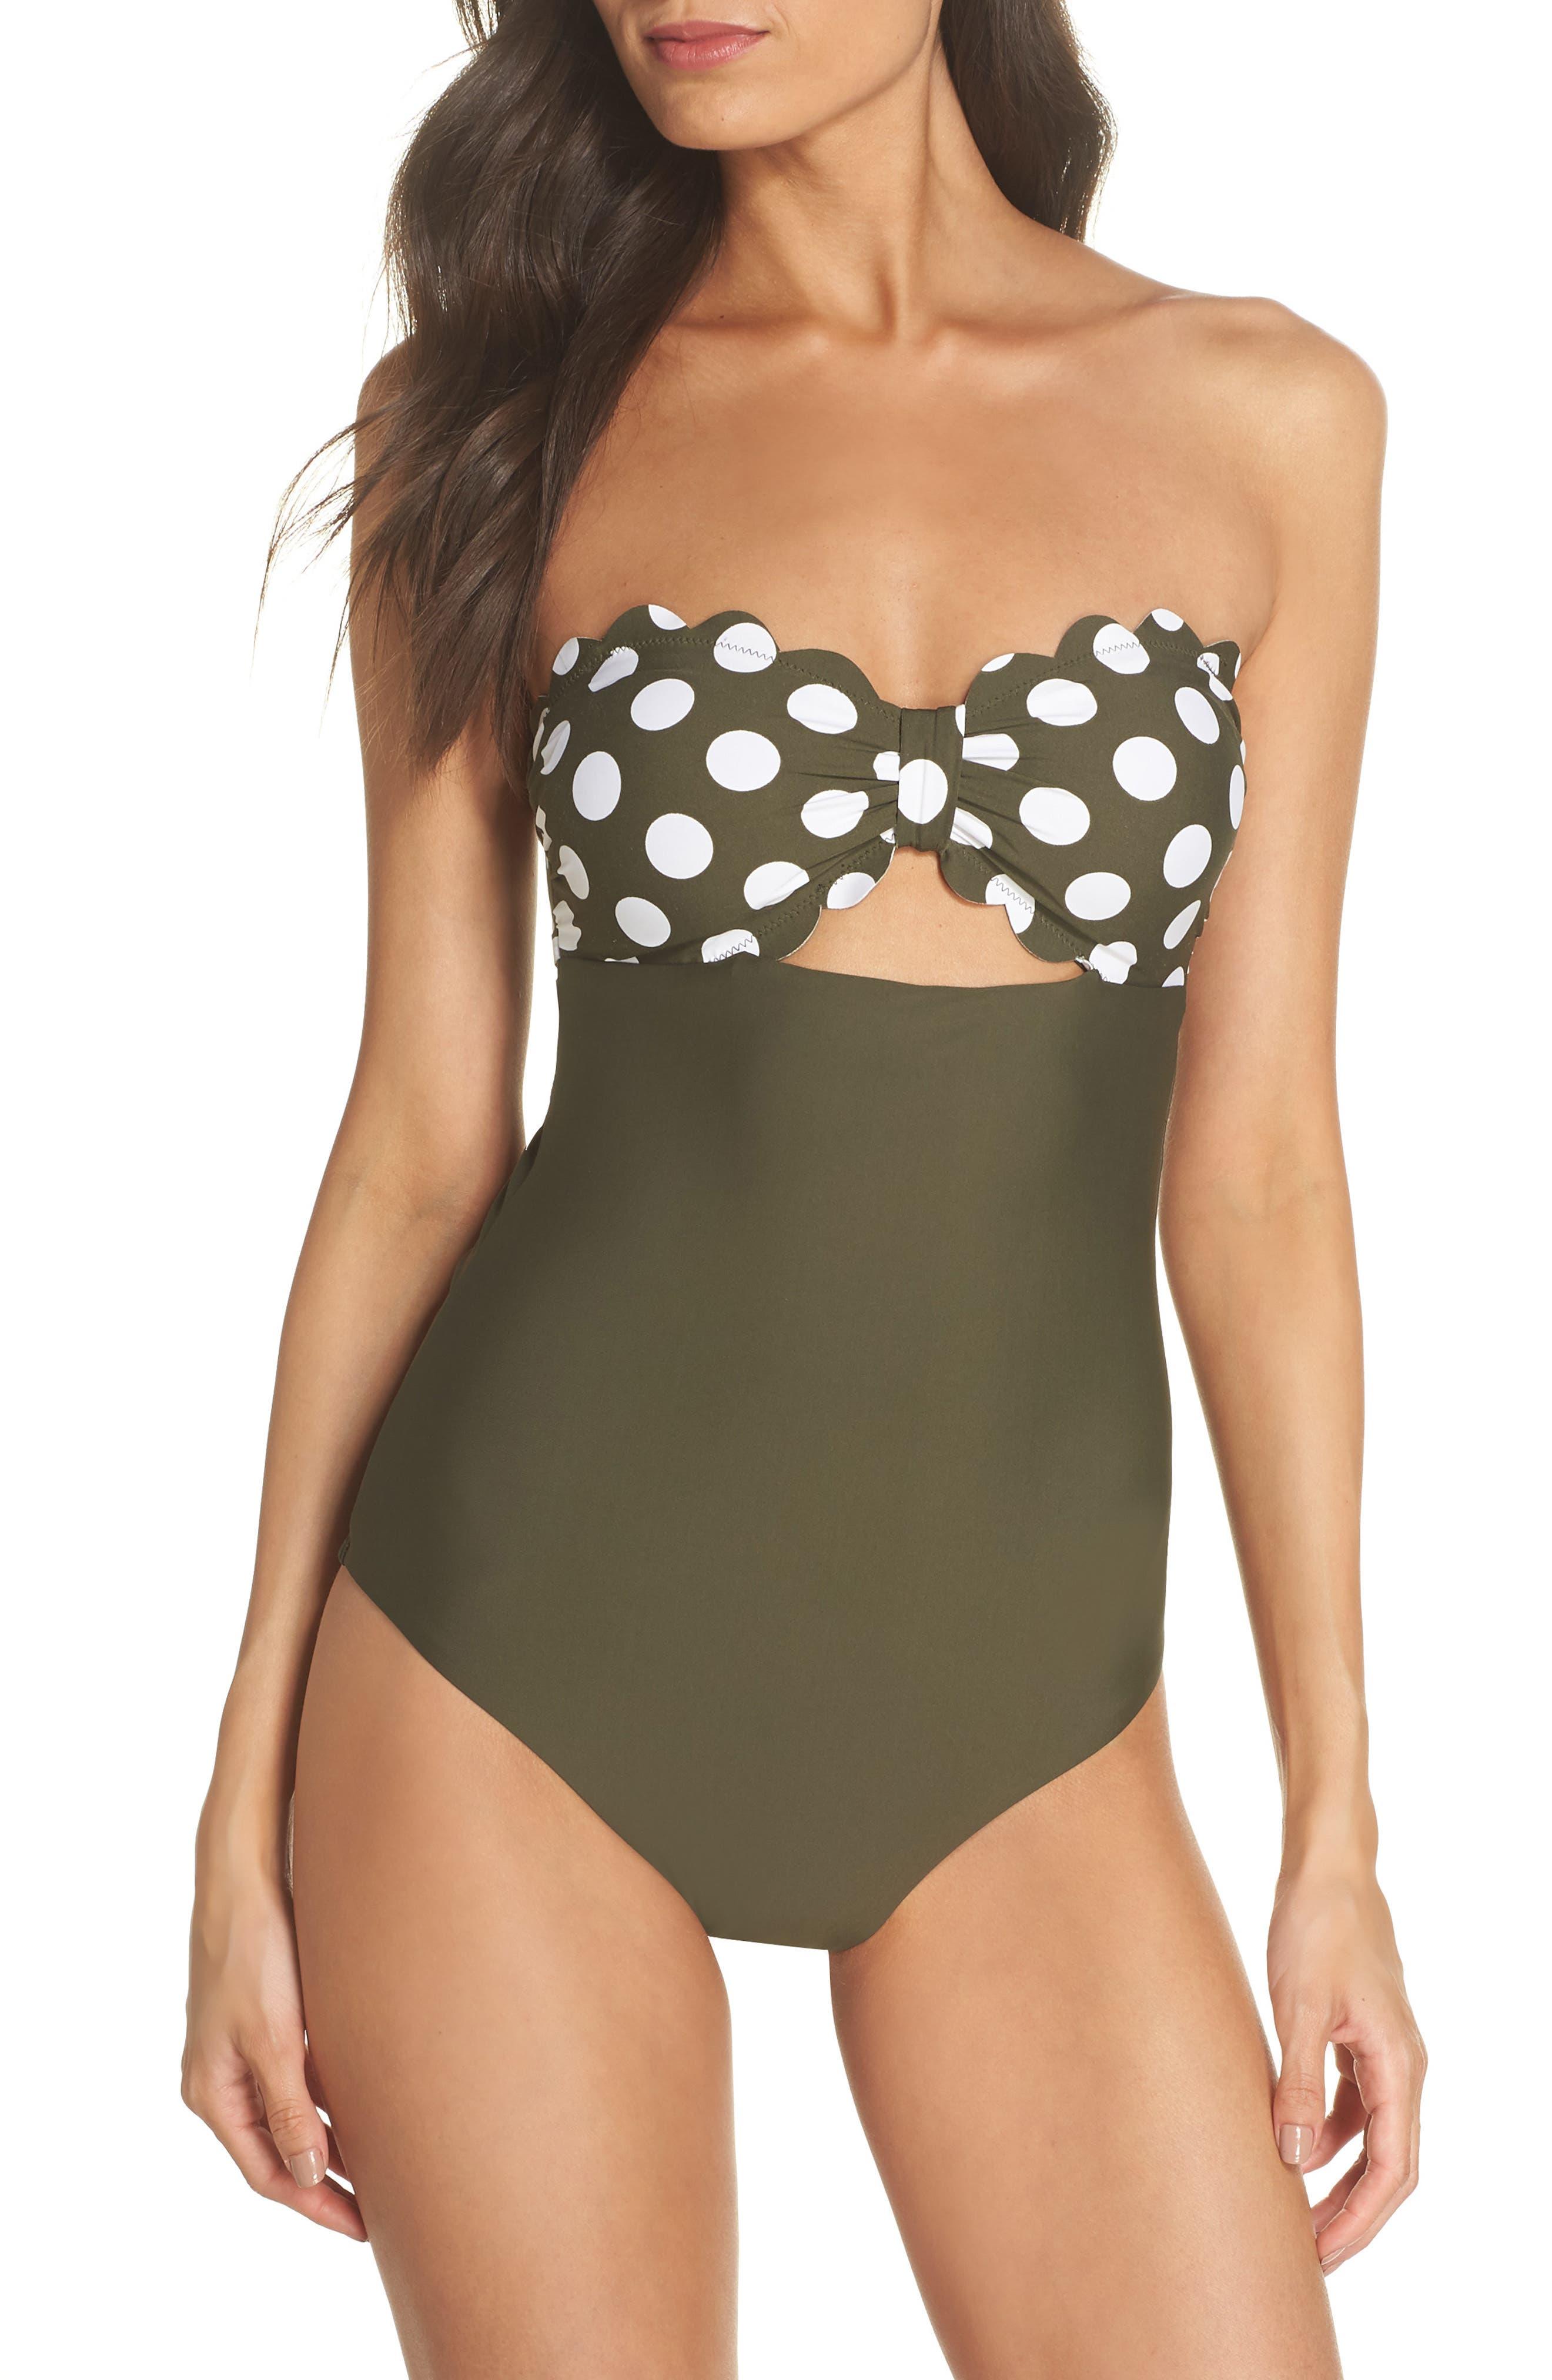 Scallop Bandeau One-Piece Swimsuit, Main, color, OLIVE SARMA/ IVORY EGRET DOT